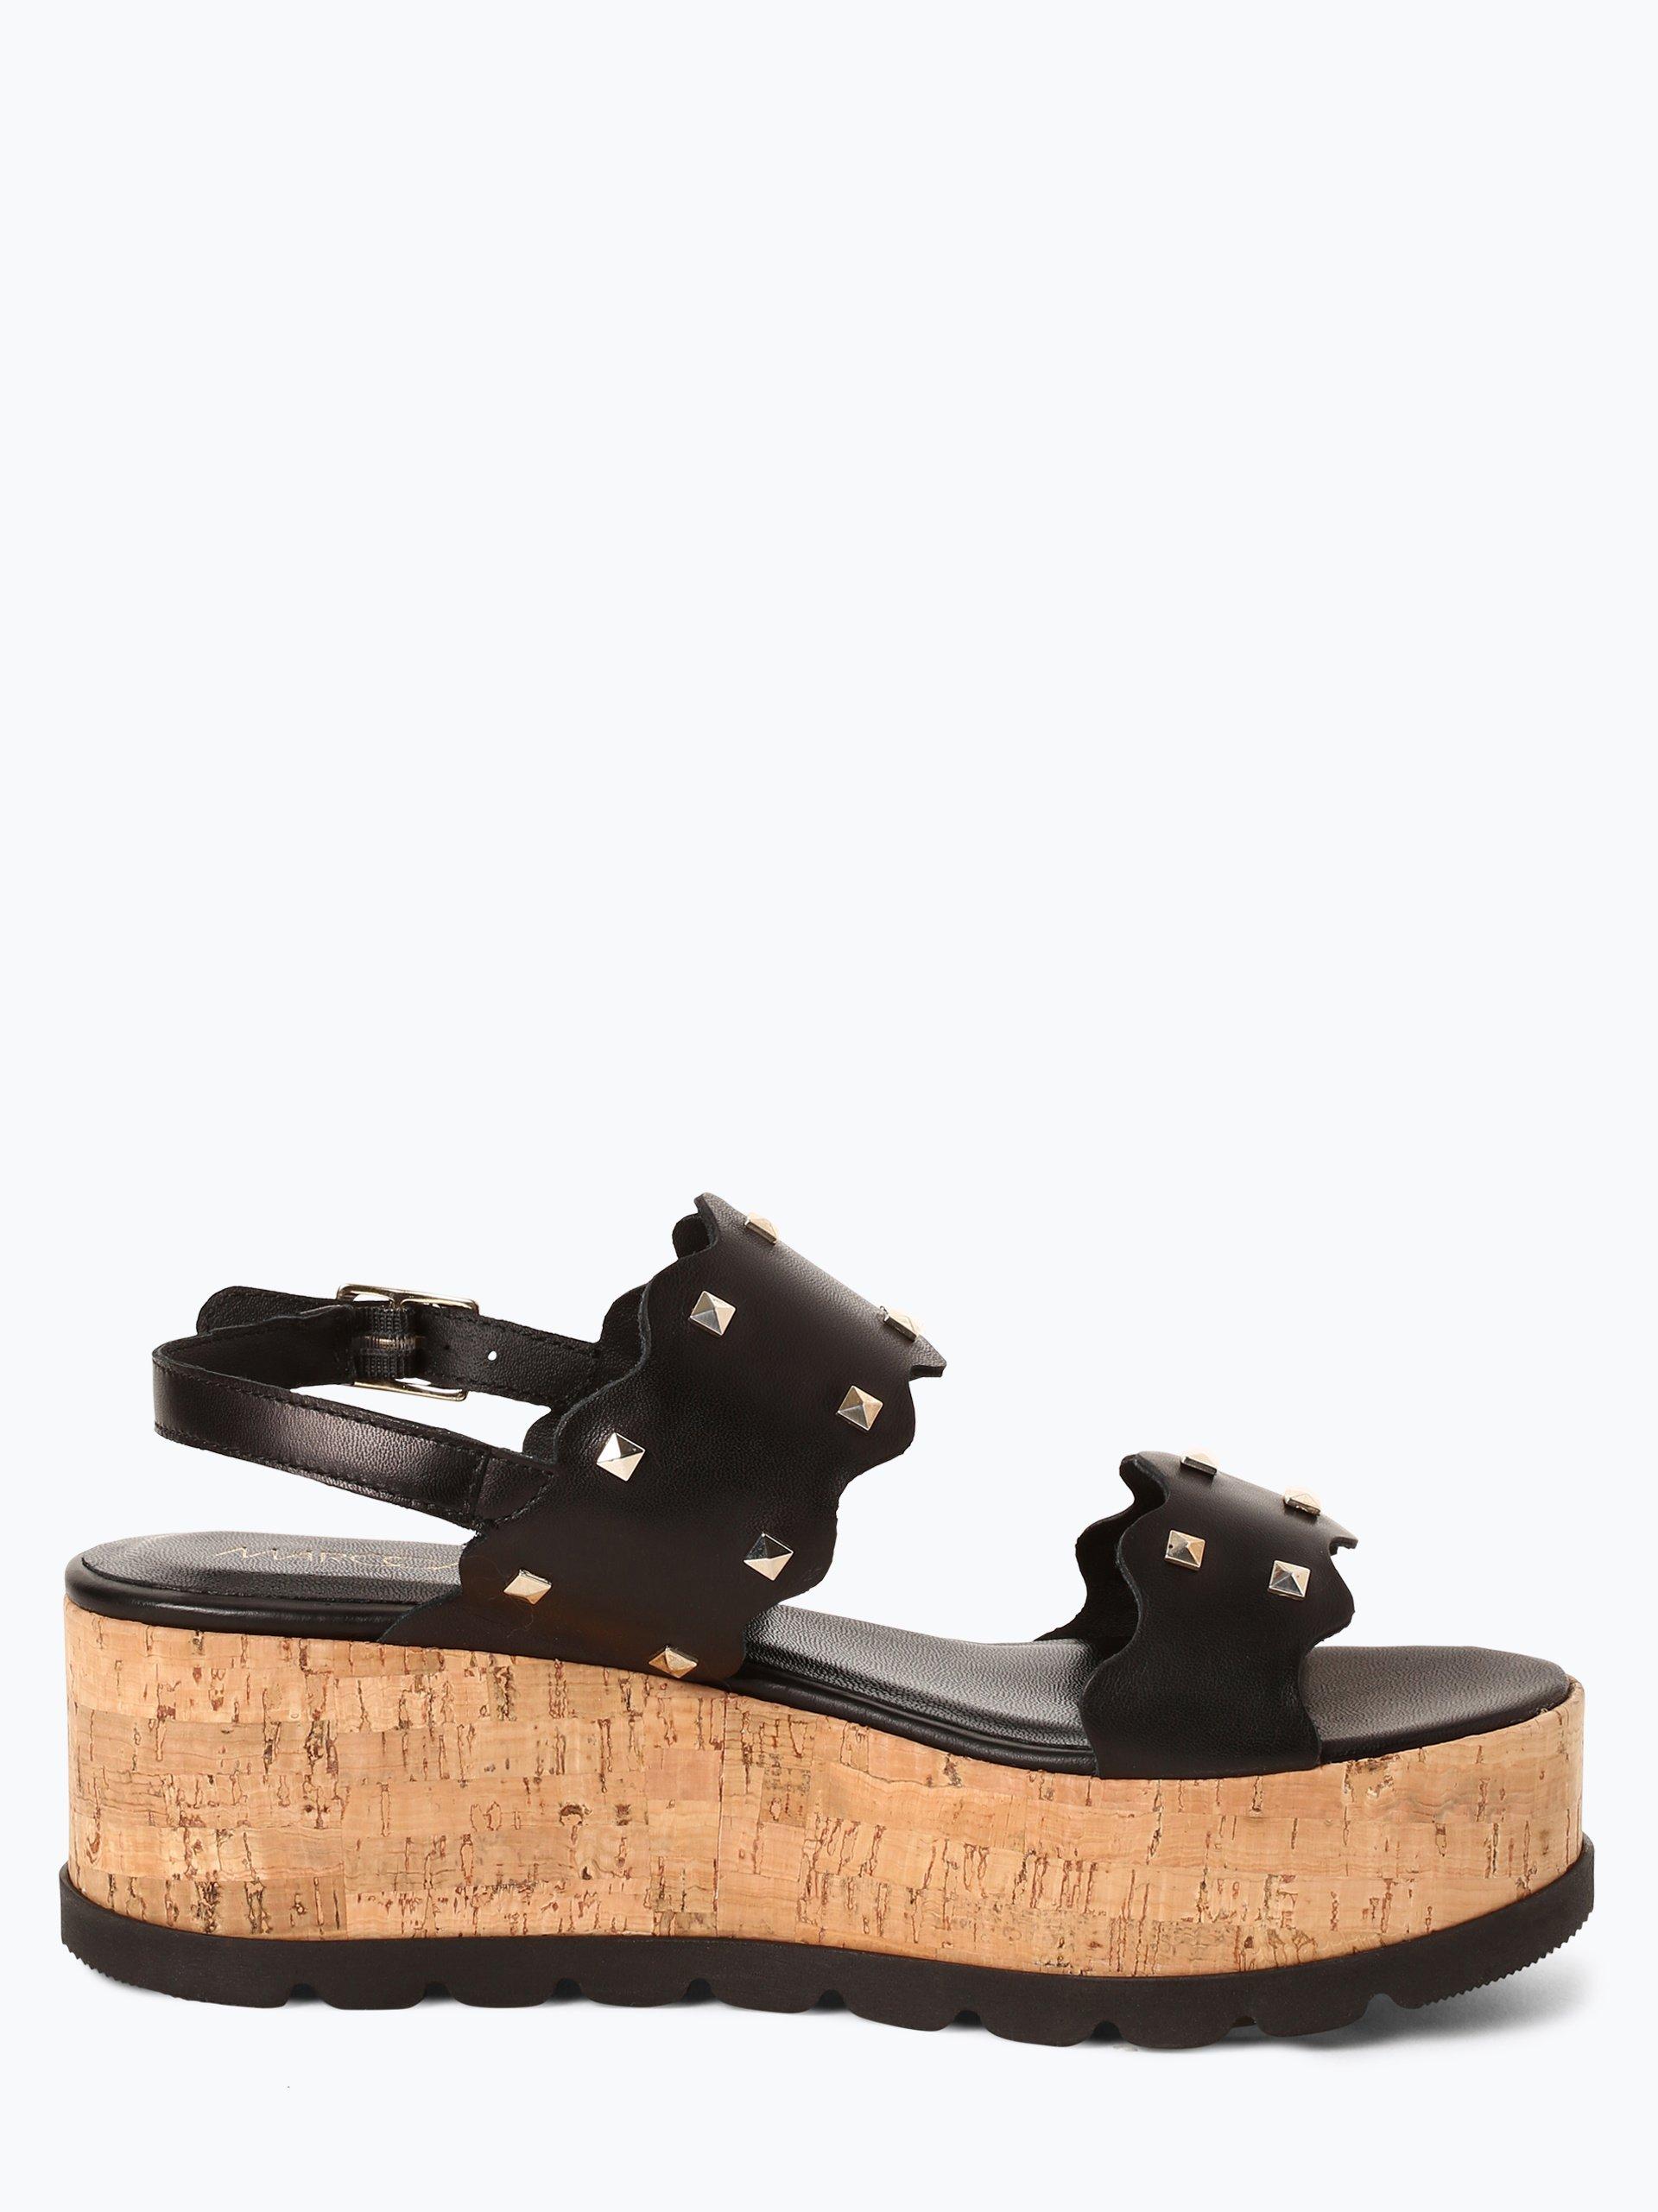 Marc Cain Bags & Shoes Damskie skórzane sandały na obcasie